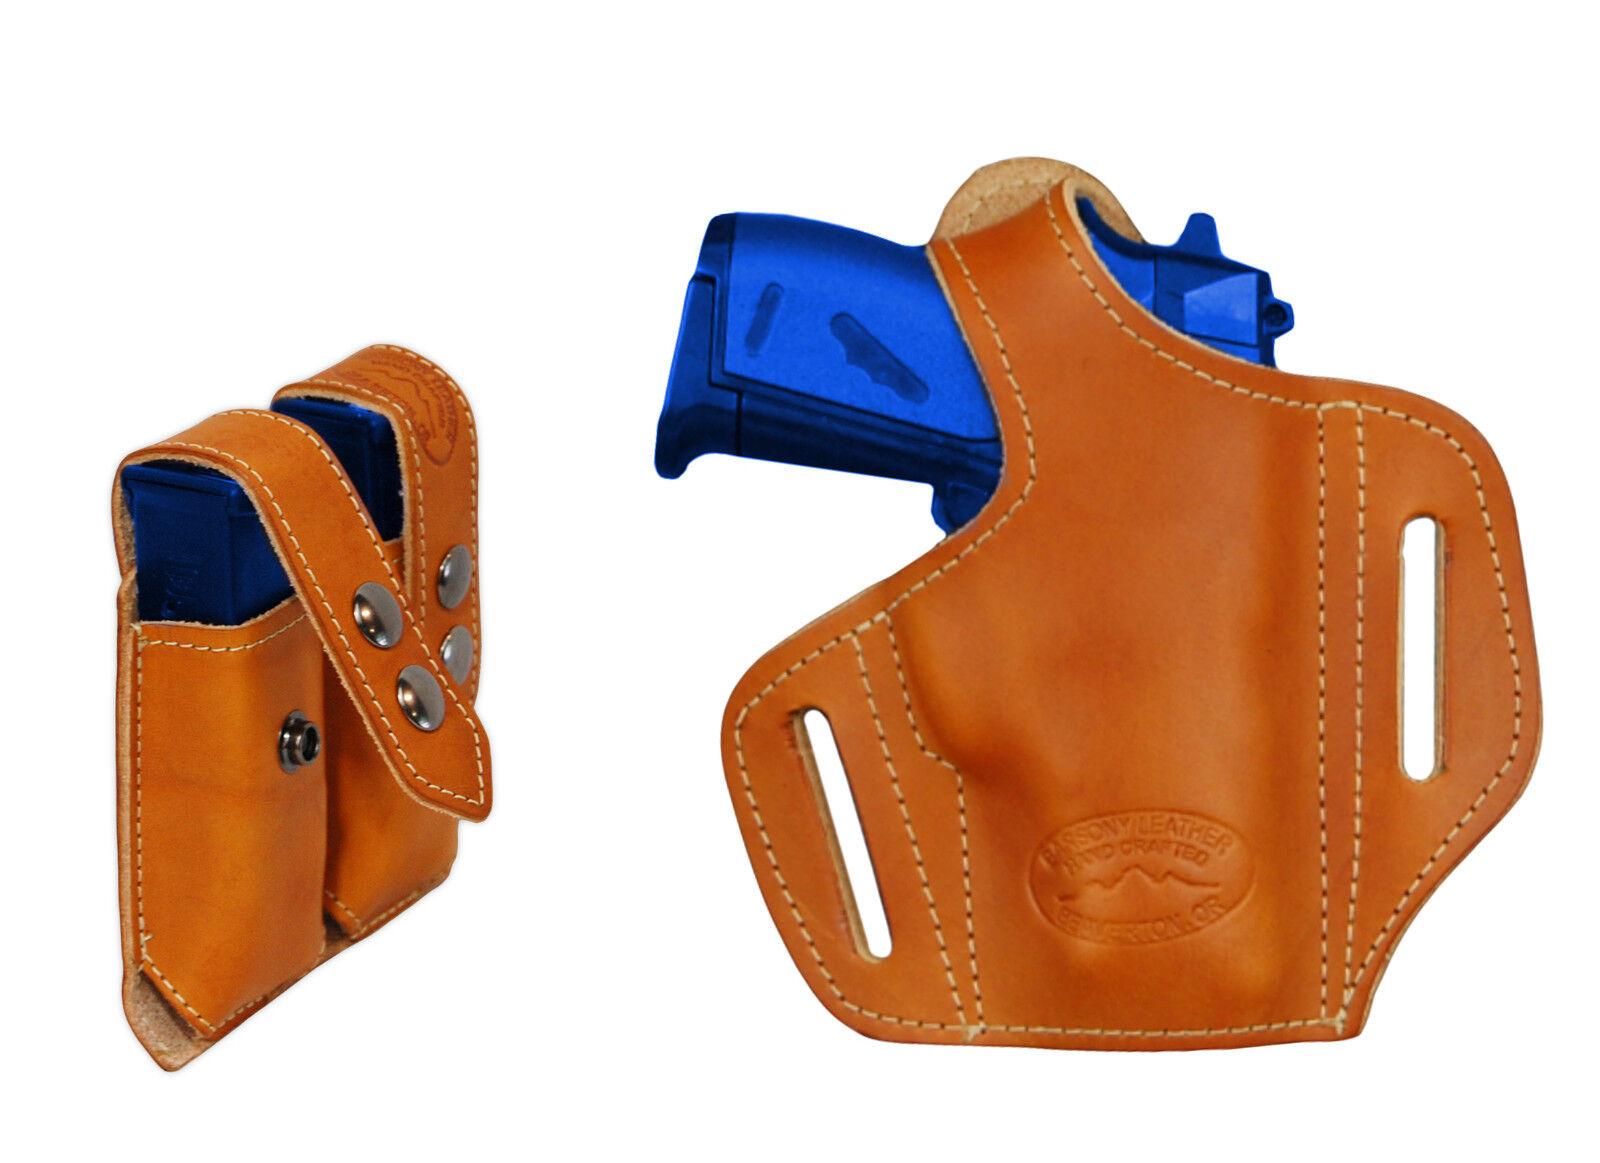 NEW Barsony Tan Leder Pancake Gun Holster + Mag Pouch Smith&Wesson 22 25 380